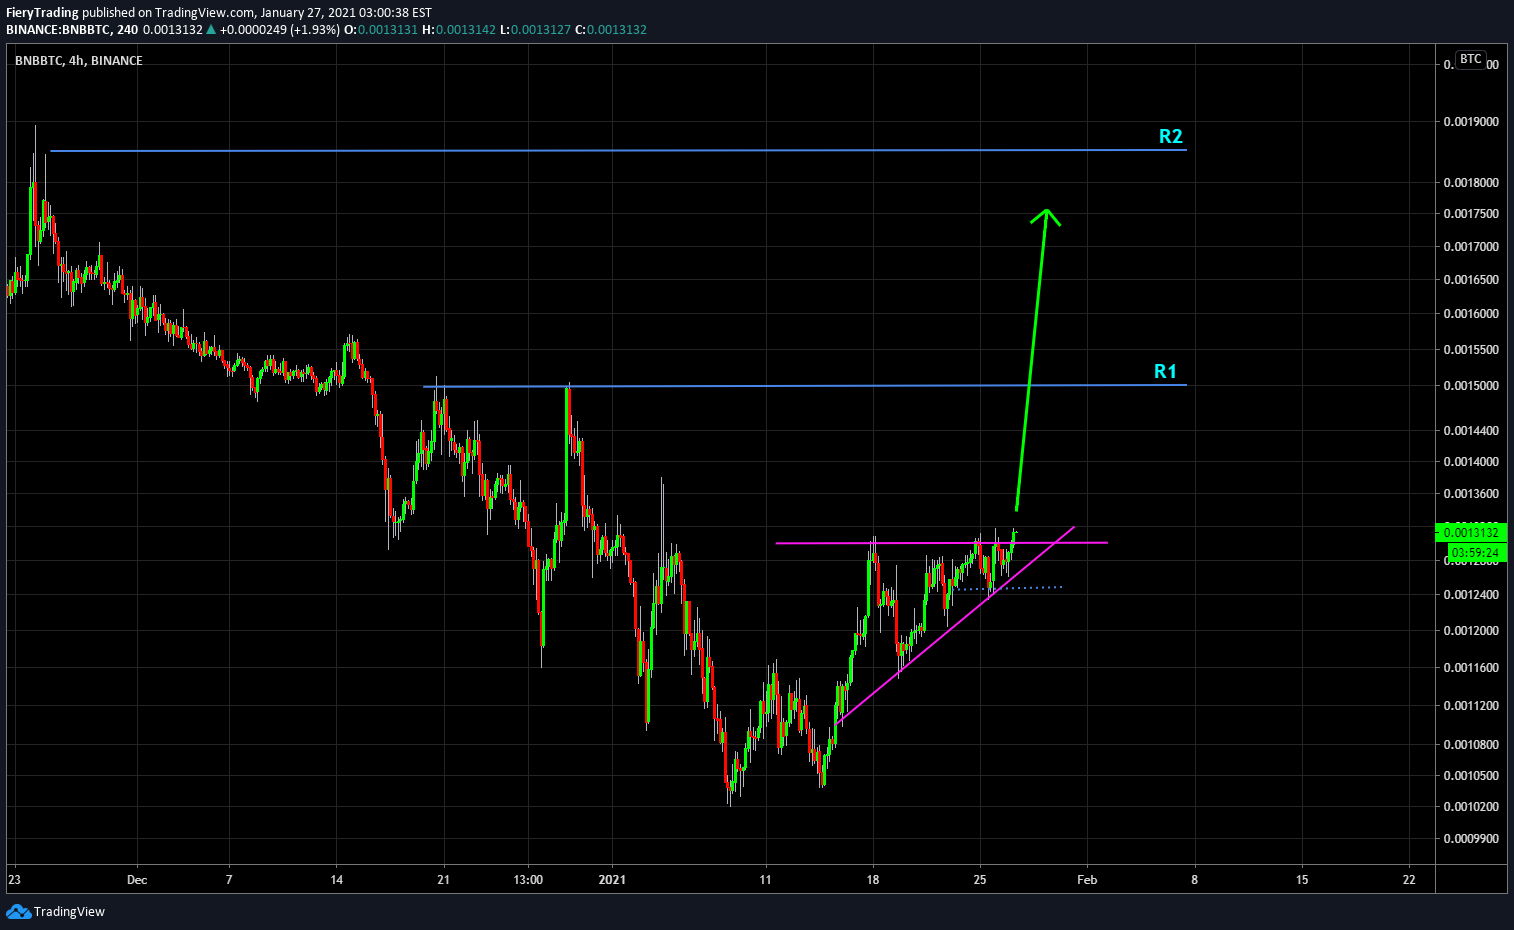 Bitcoin Eur Xbt usd tradingview